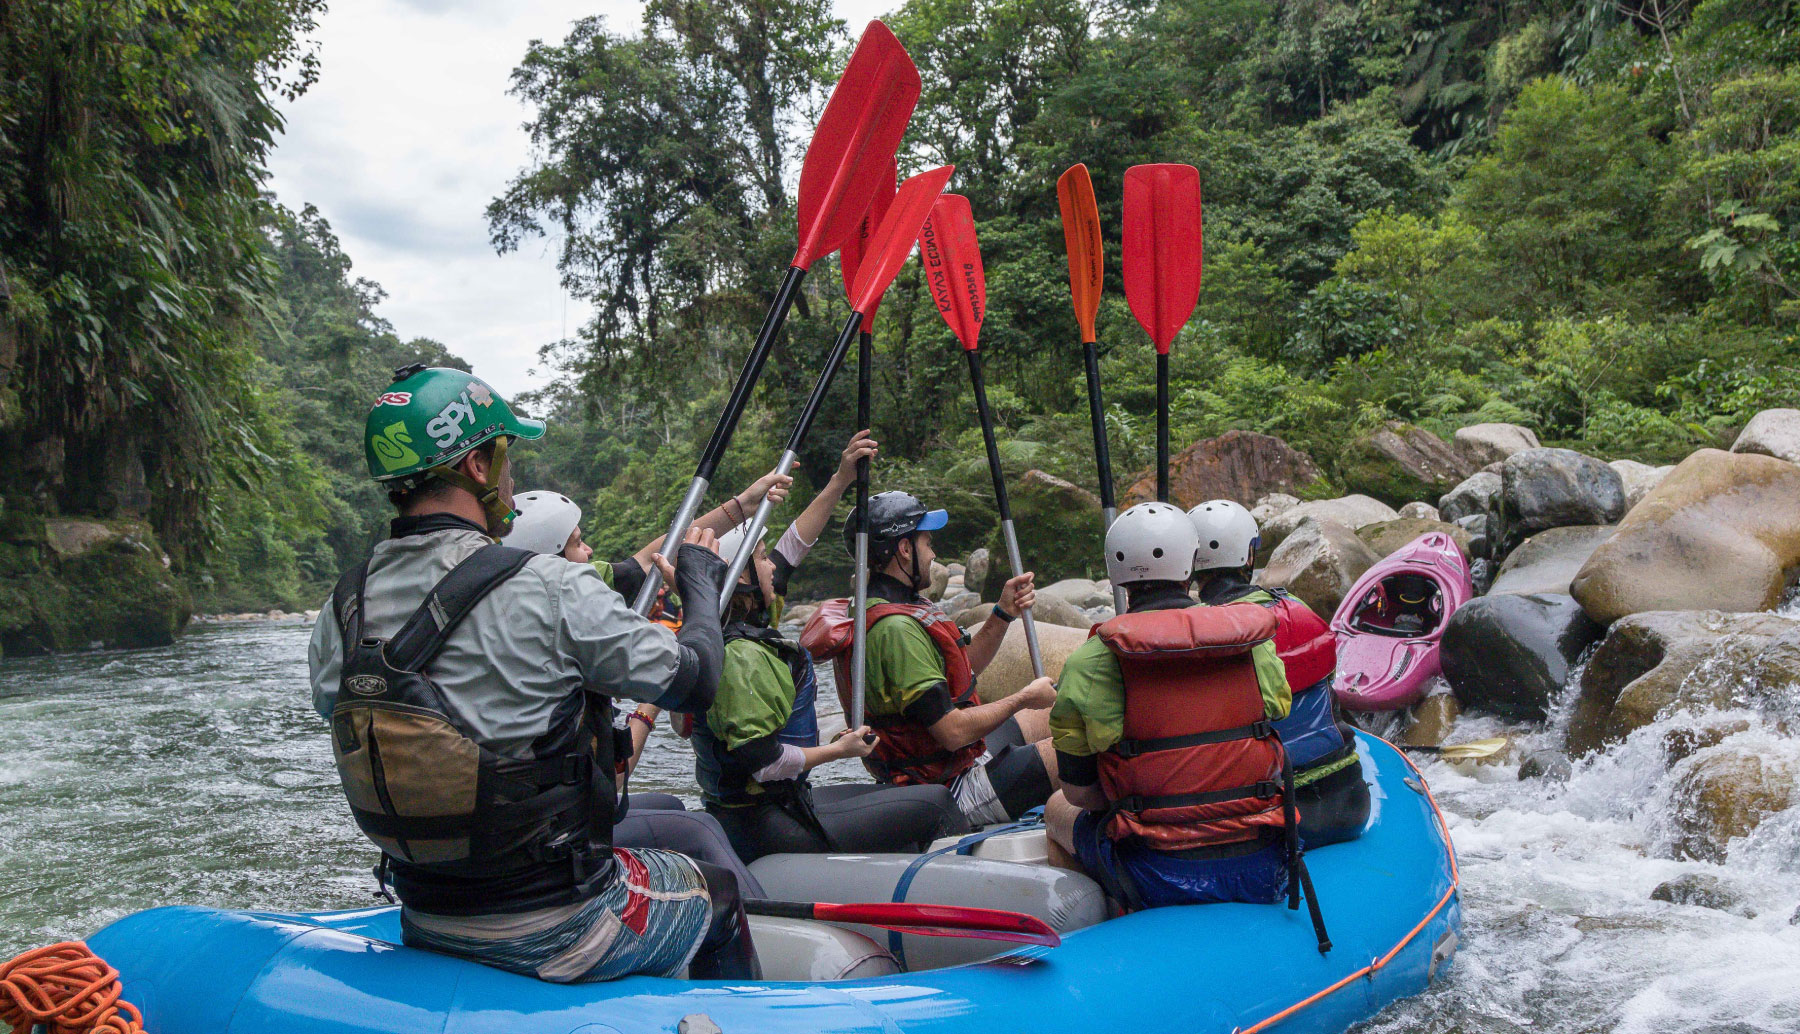 Celebration after running one of many rapids on the Jondachi river. Rafting Class IV Jondachi   Hollin rivers